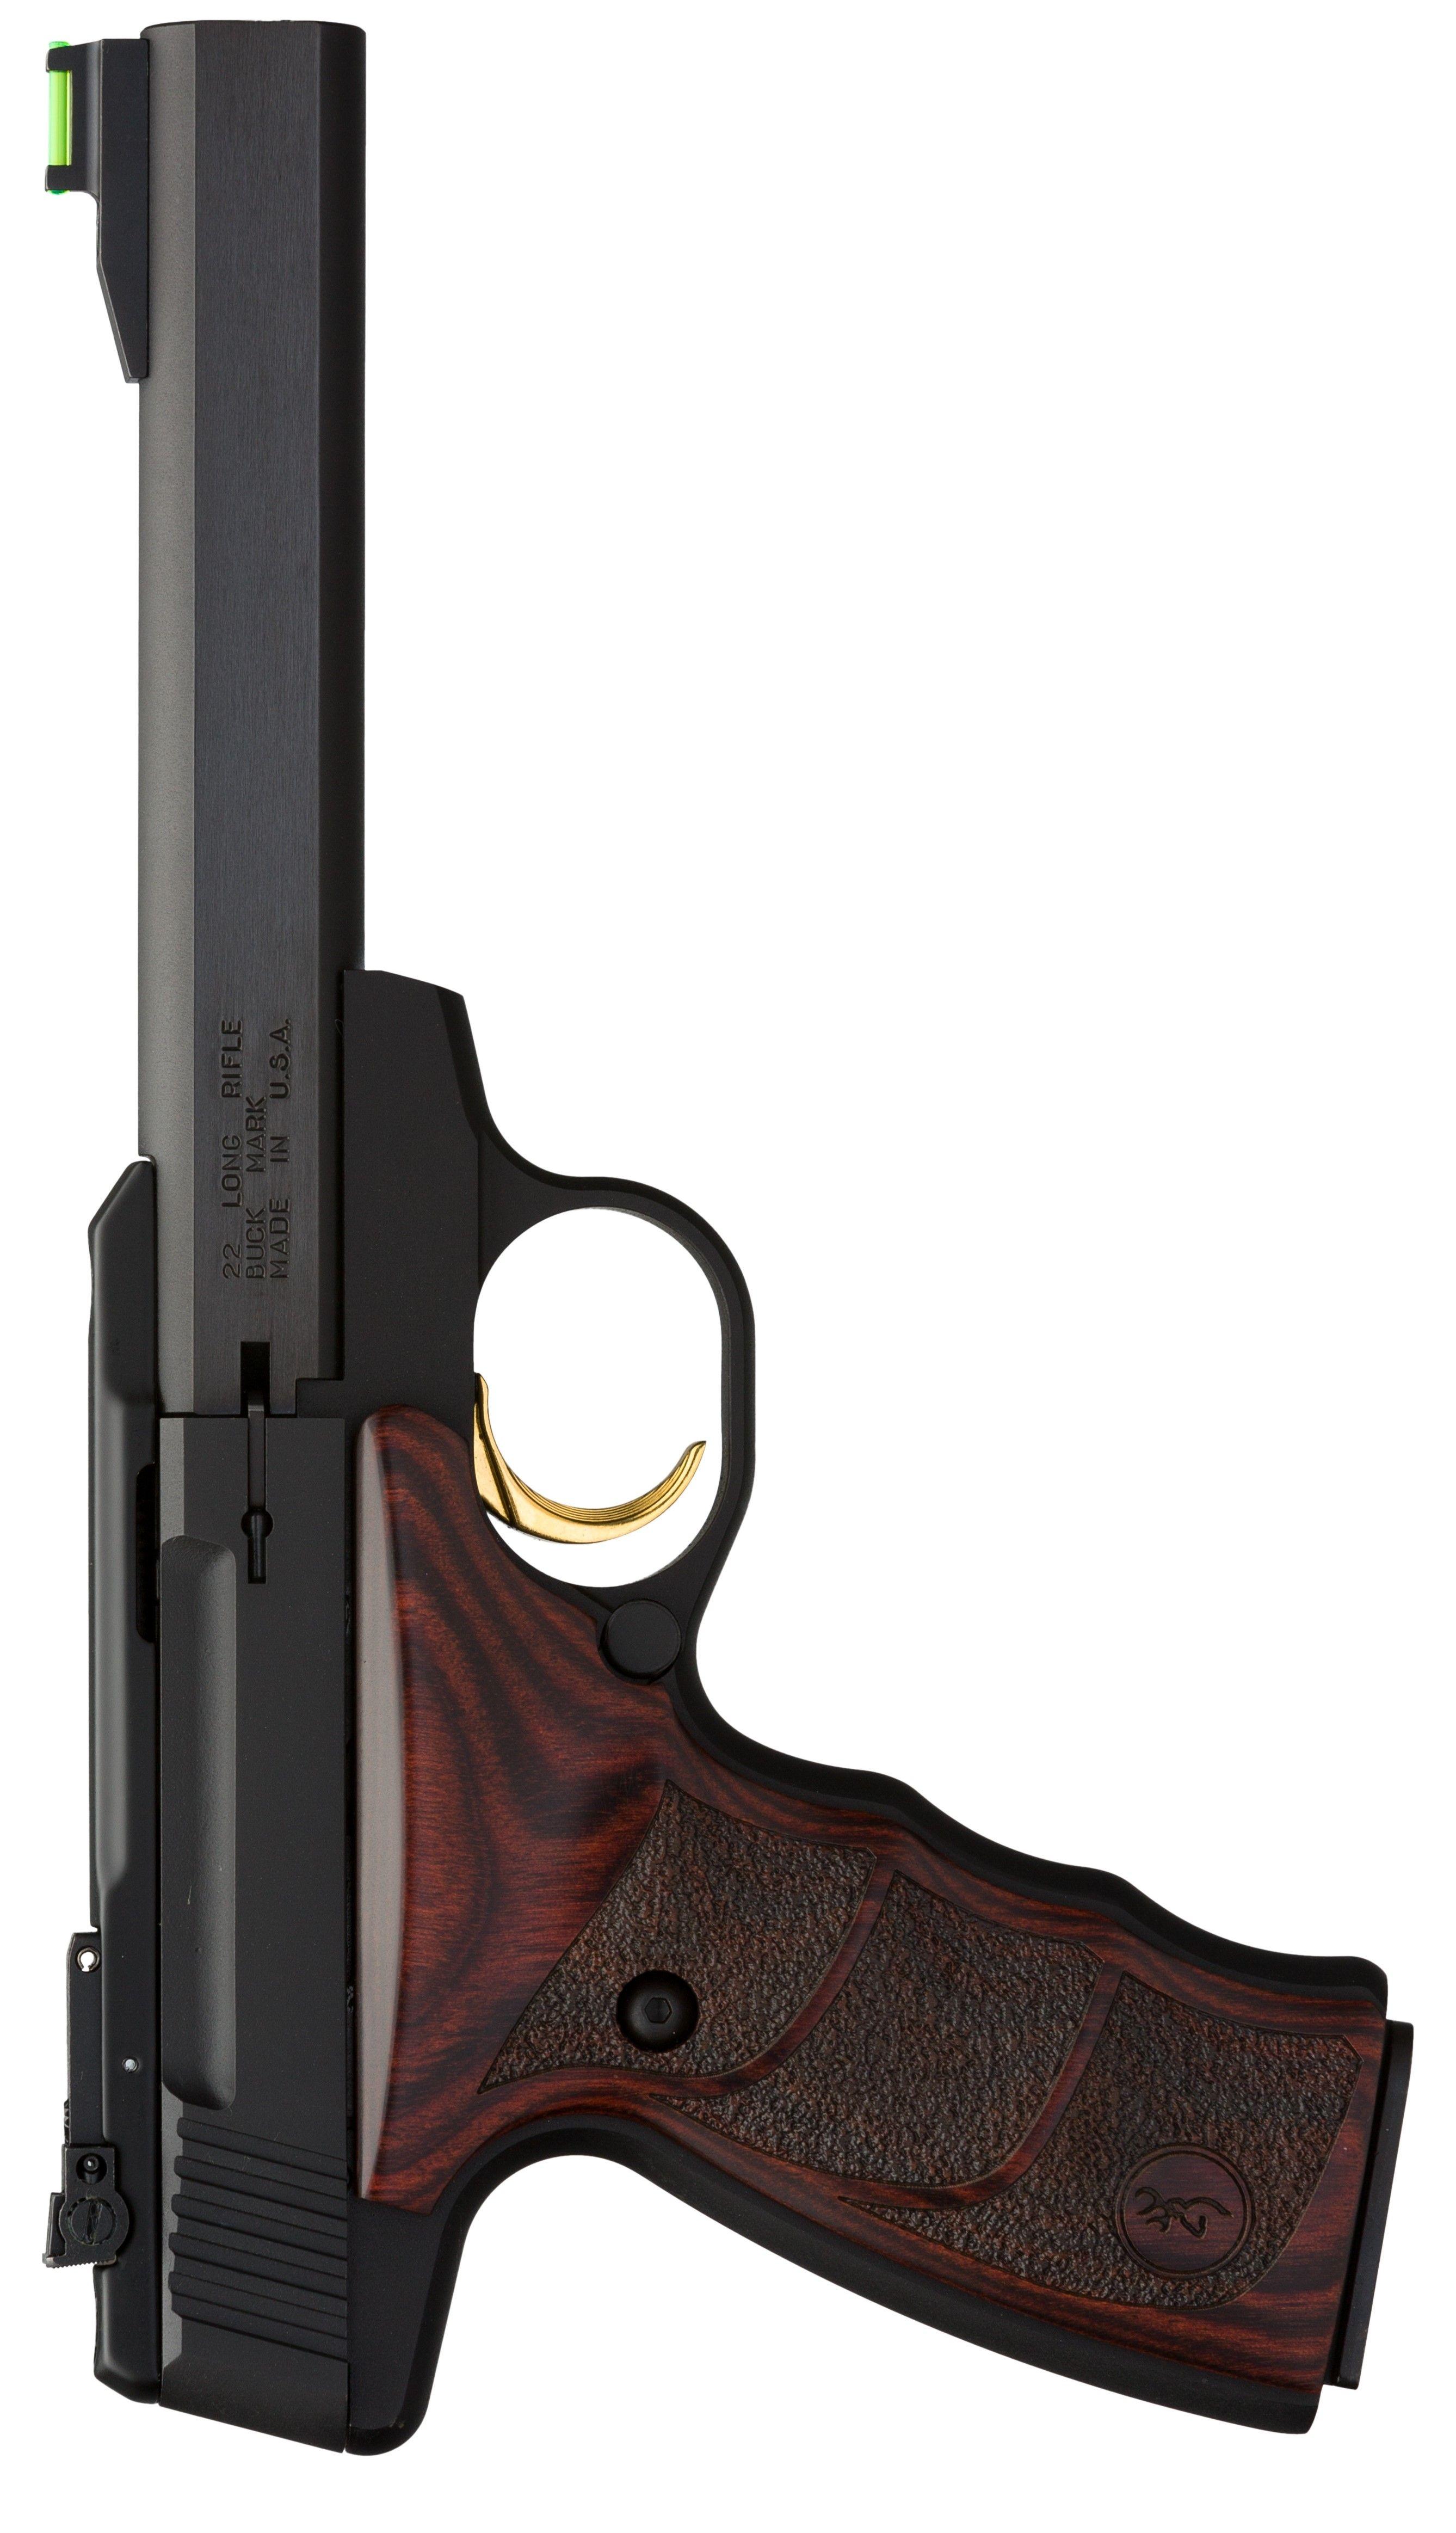 Browning Buck Mark Plus Rosewood Udx 540 Msrp Alloy Receiver Blued Finish Slab Side Barrel Brown Wood Textured Grips Fin Guns Military Guns Guns Pistols